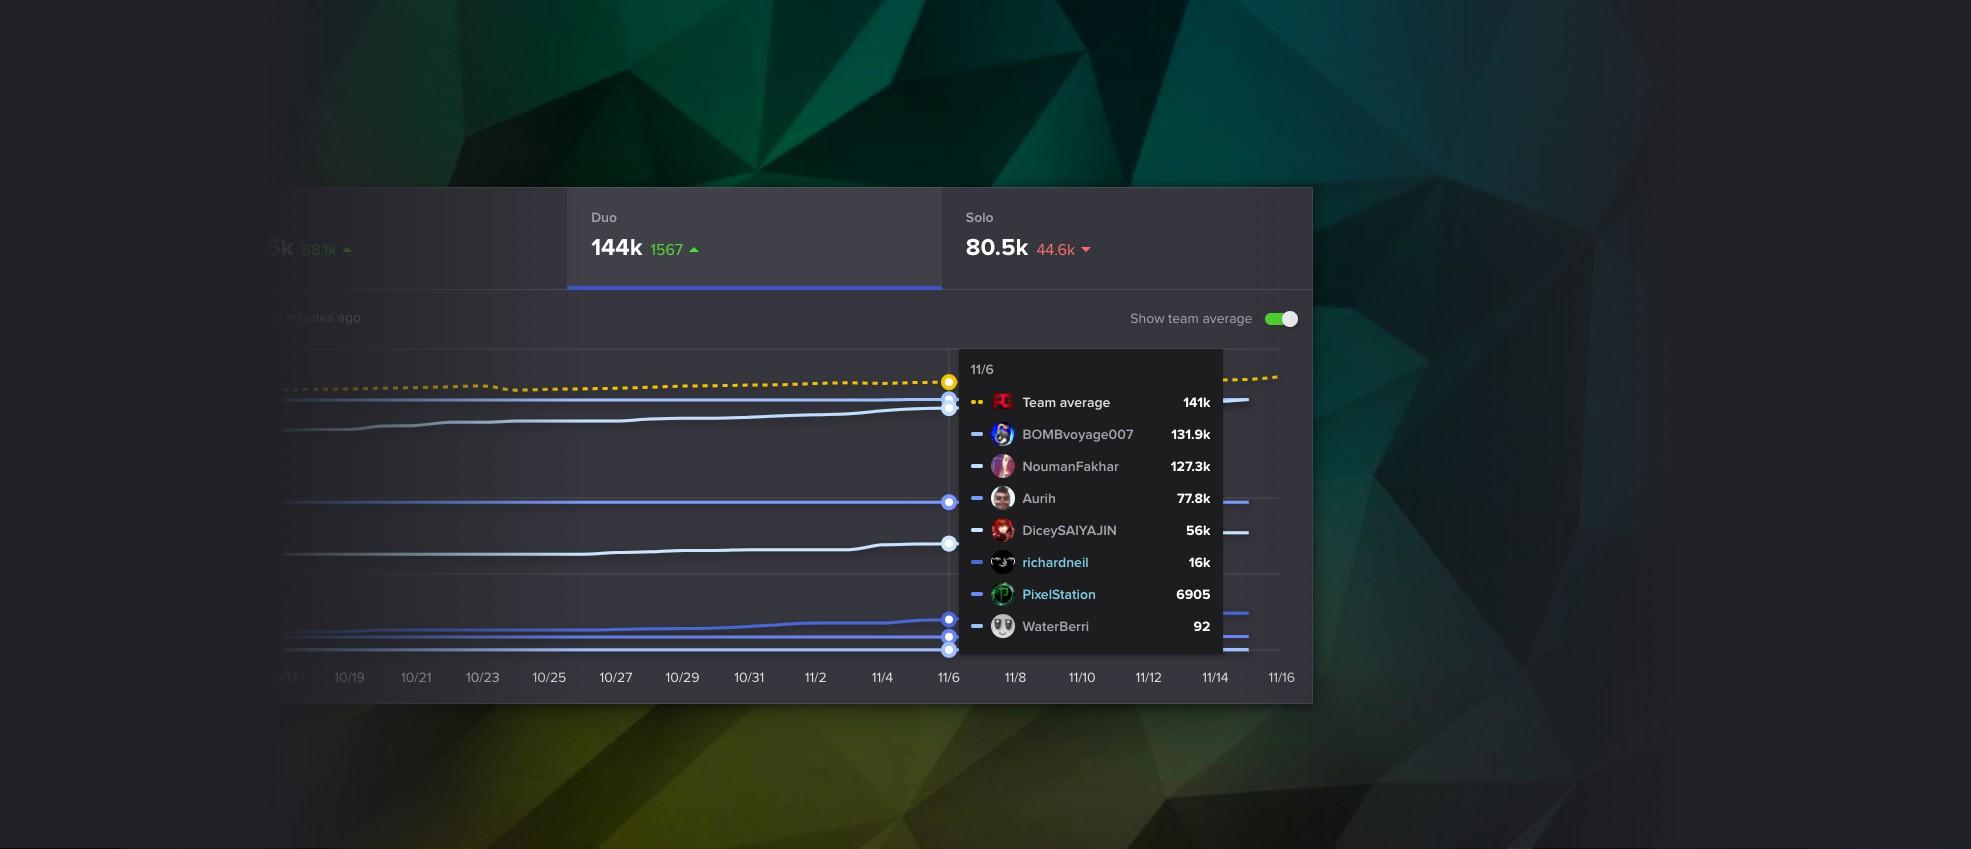 Fortnite Stat Tracker Discord Bot | Fortnite Cheat On Ps4